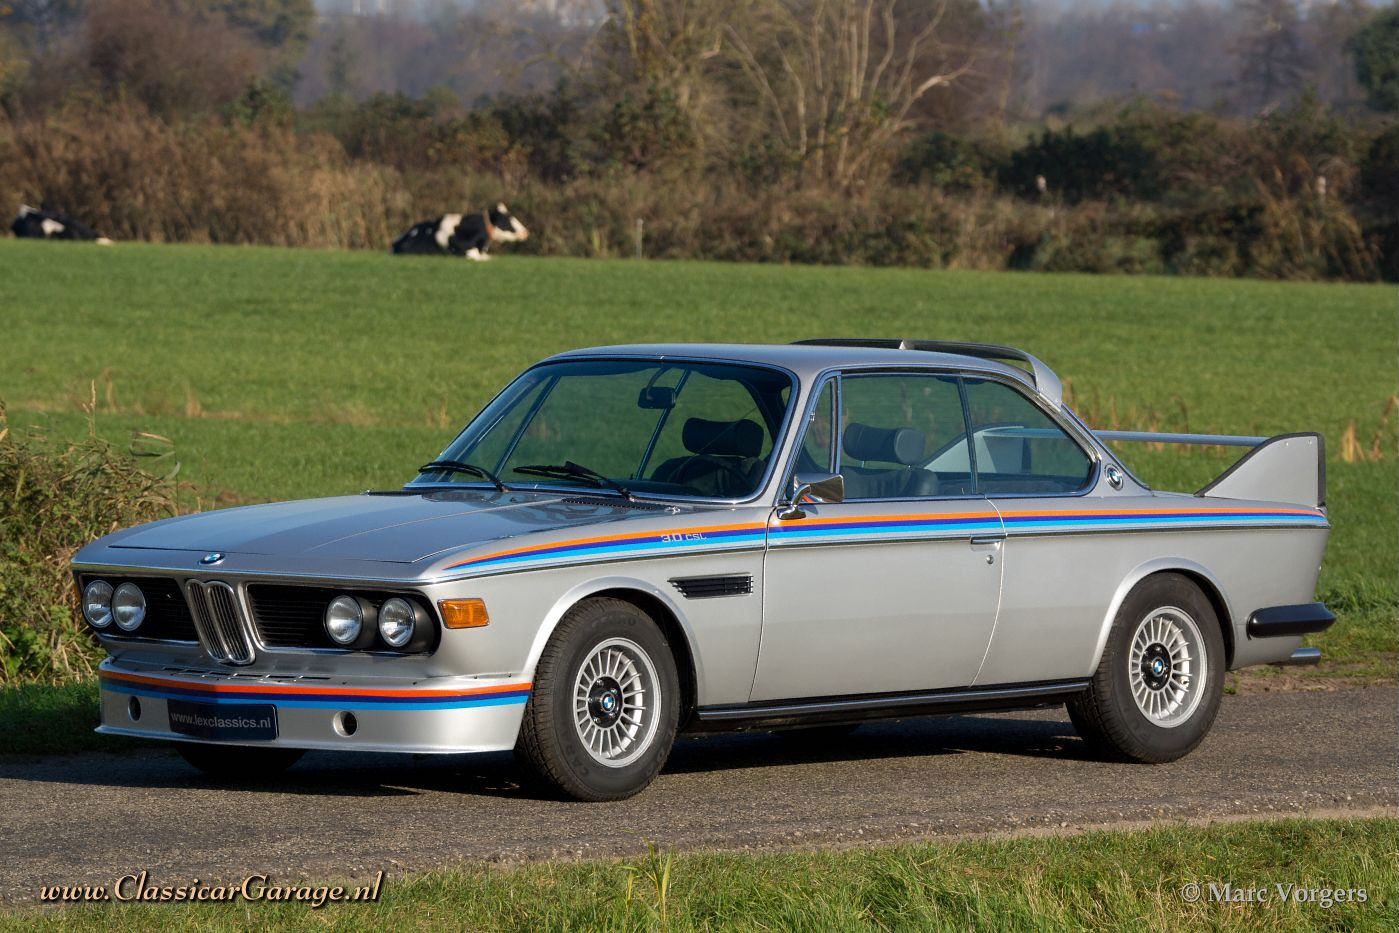 1973 3.0 Csl >> BMW 3.0 CSL 'Batmobile', 1973 details